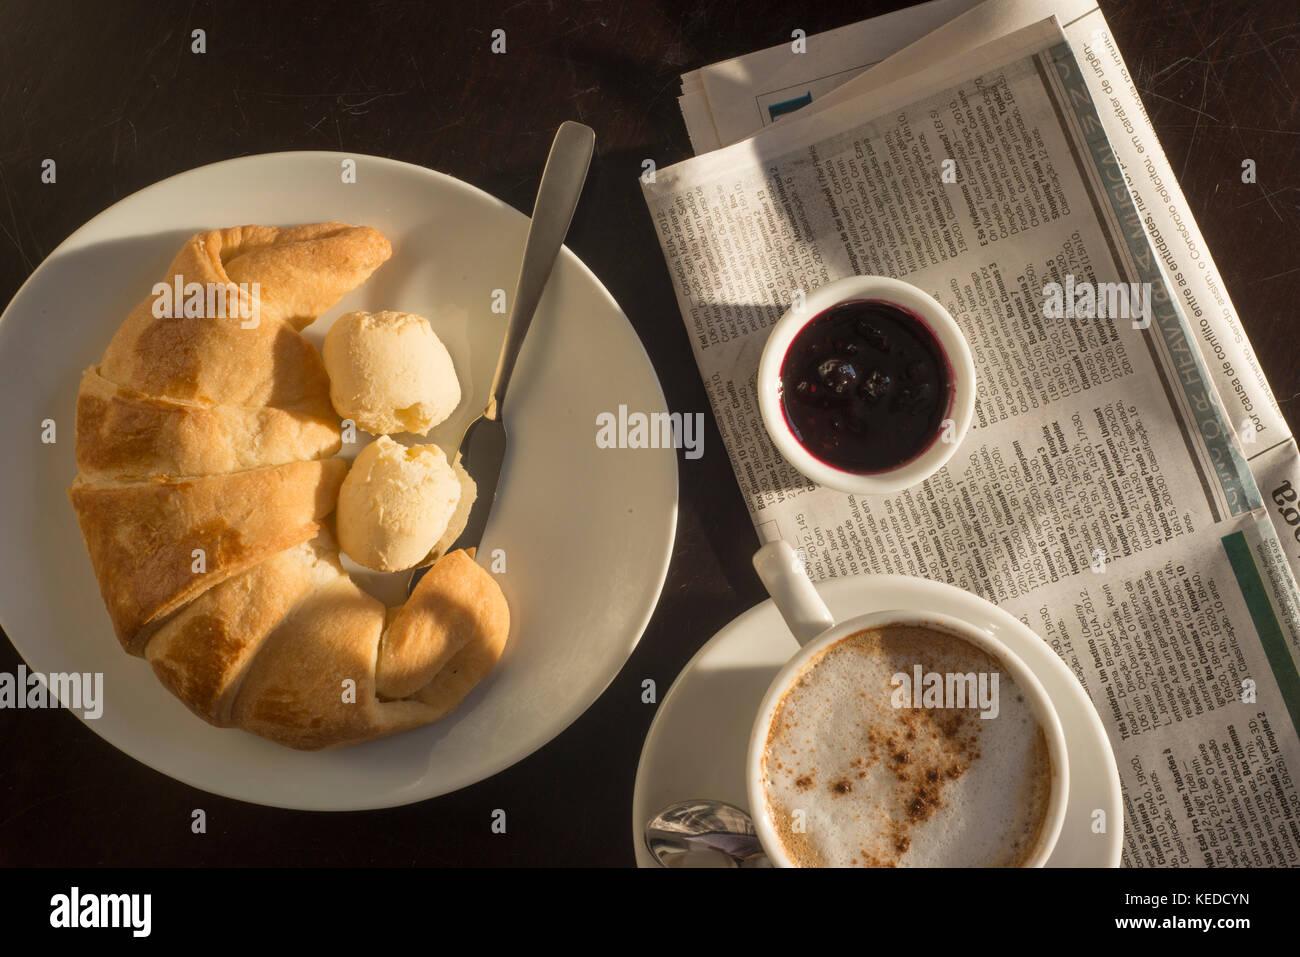 Breakfast table - Stock Image